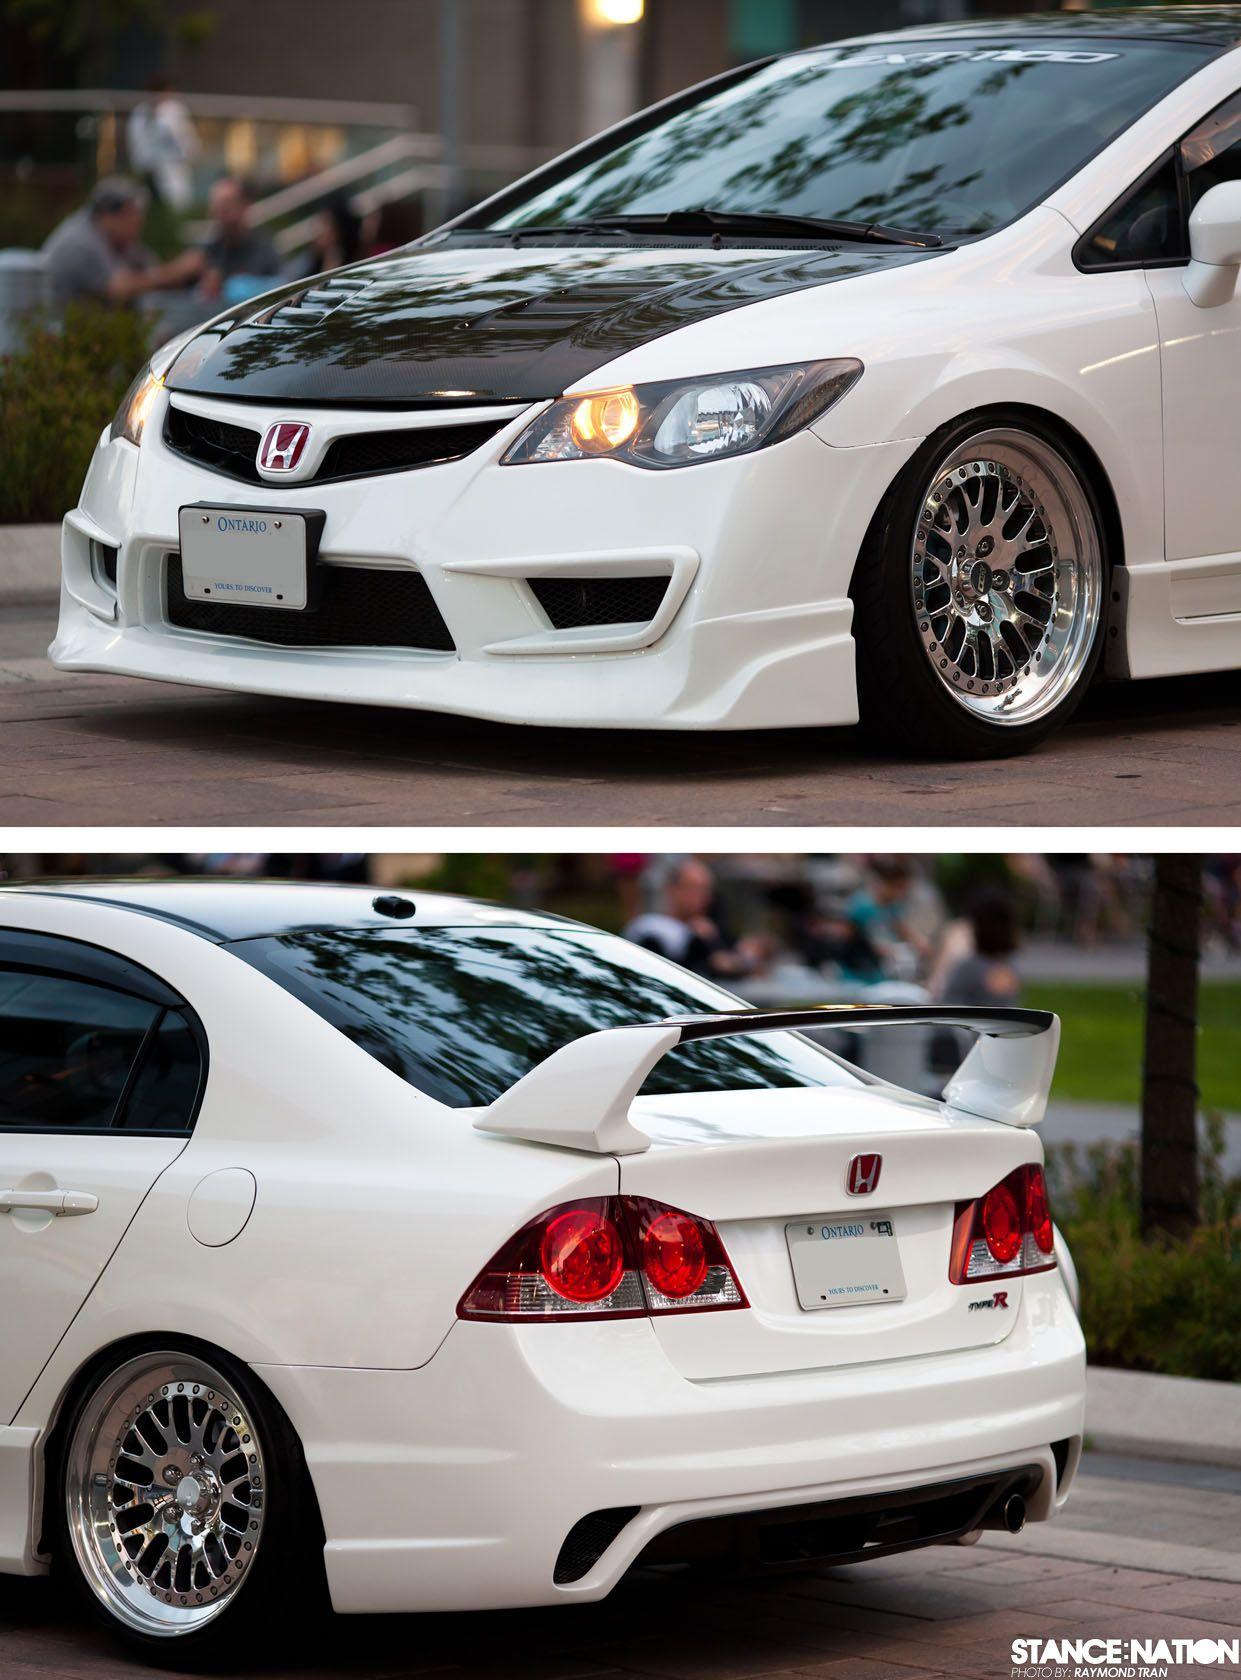 Honda Civic Modificado : honda, civic, modificado, Properly, Reppin', Toronto!, StanceNation™, Function, Honda, Civic, Sedan,, Civic,